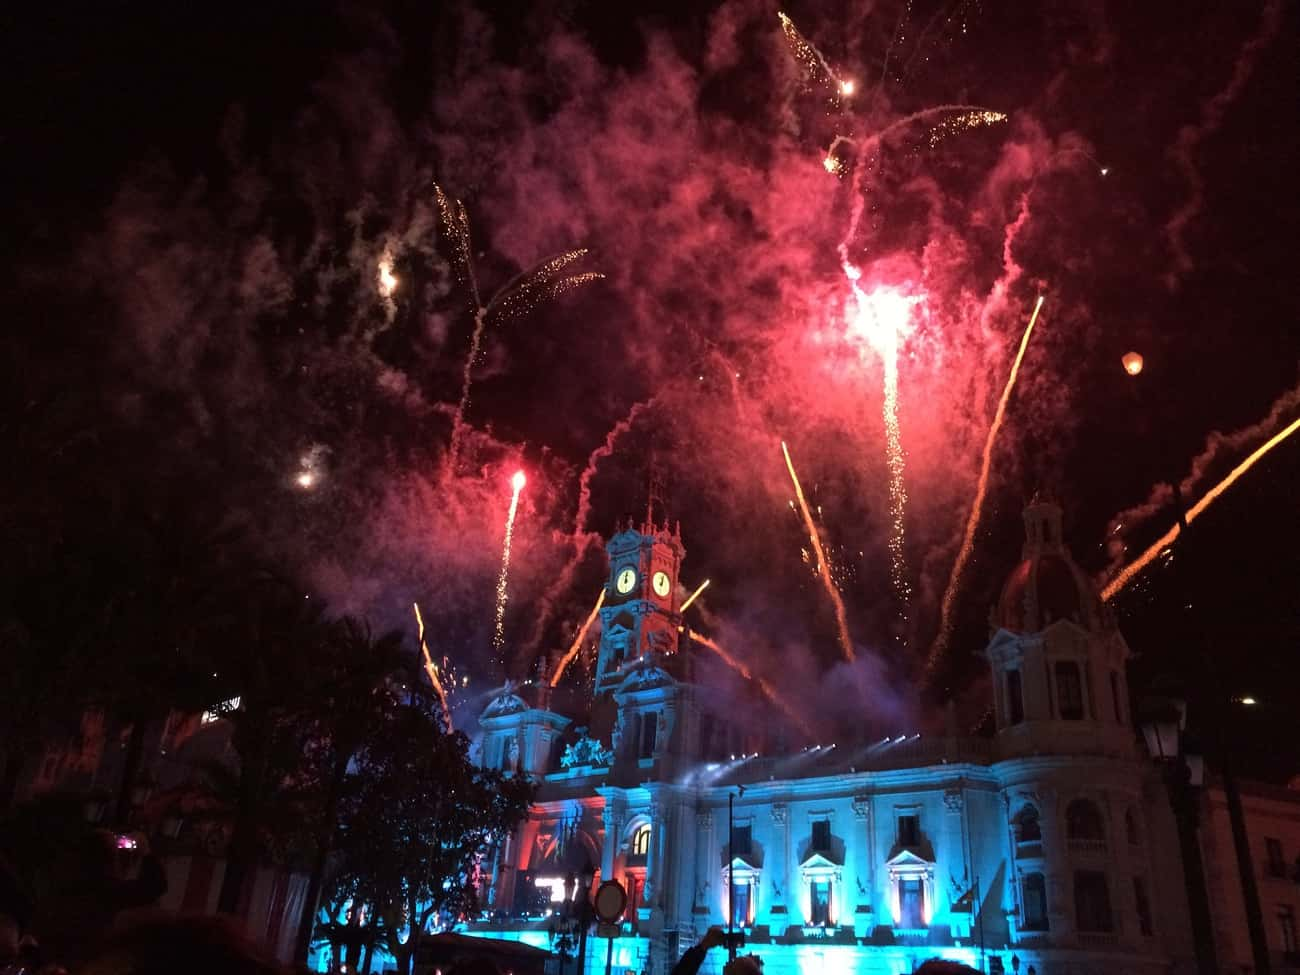 Valencia - New Year's Eve fireworks